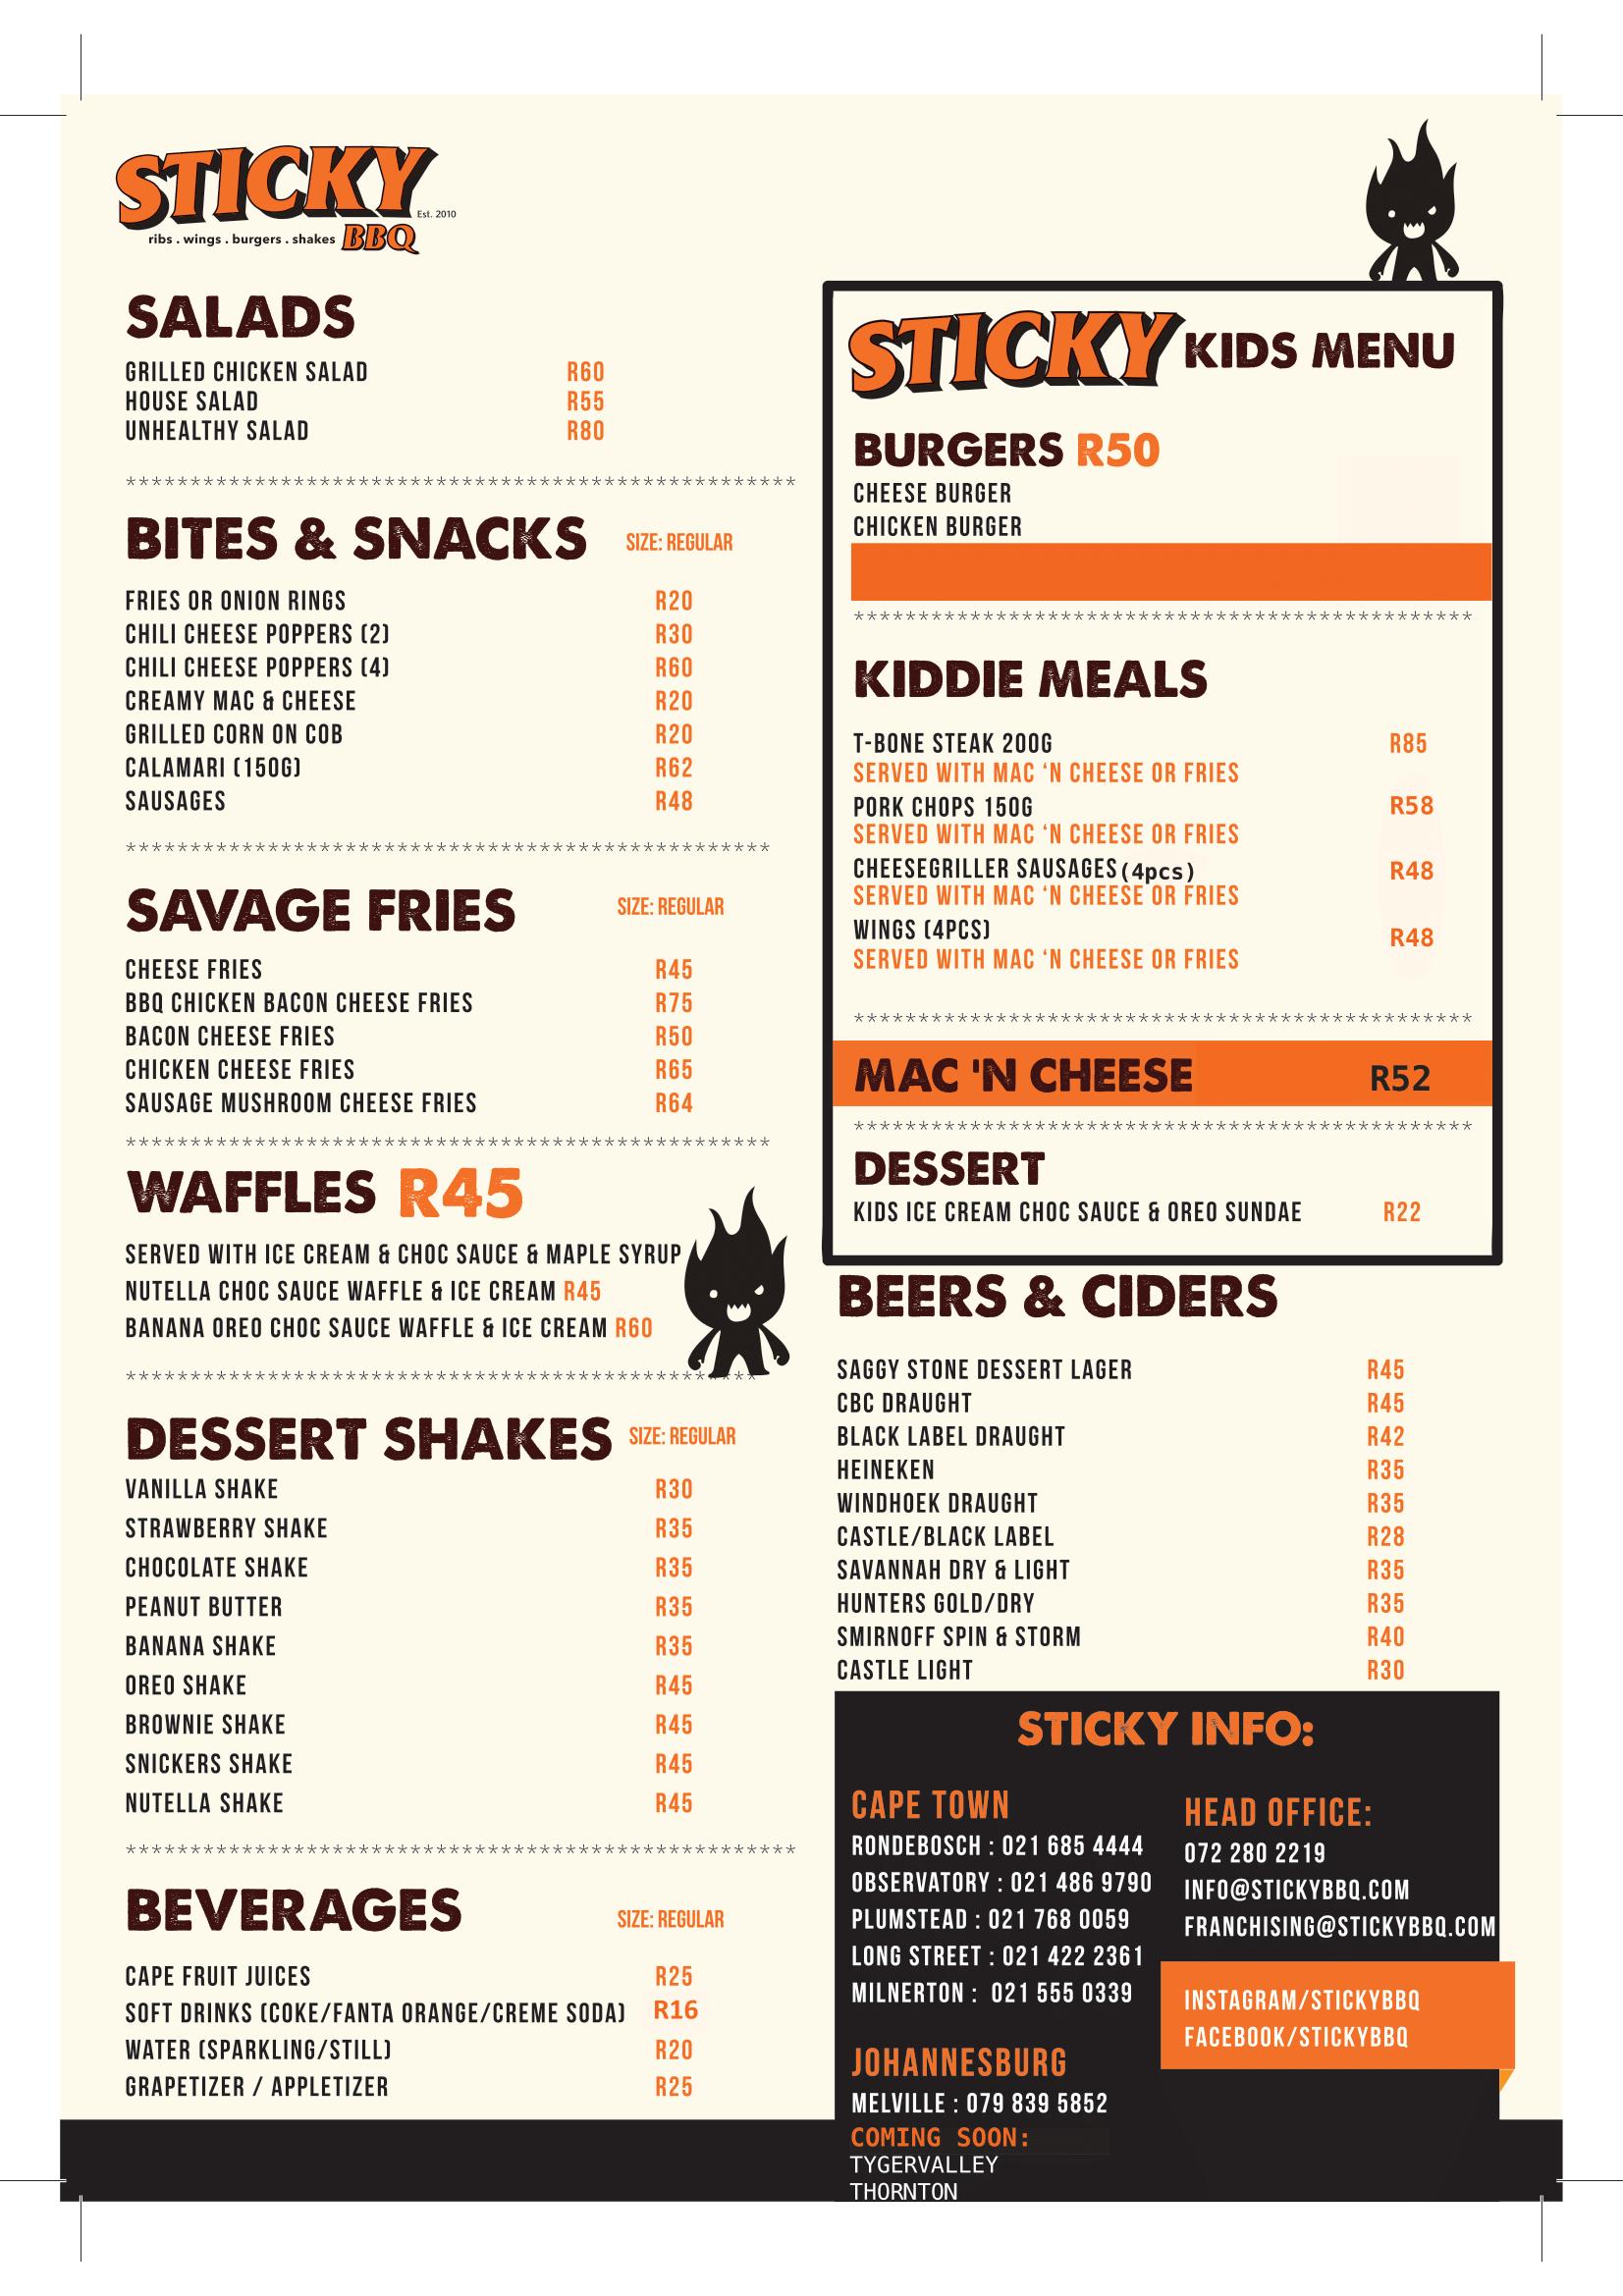 STICKY BBQ 2021-2